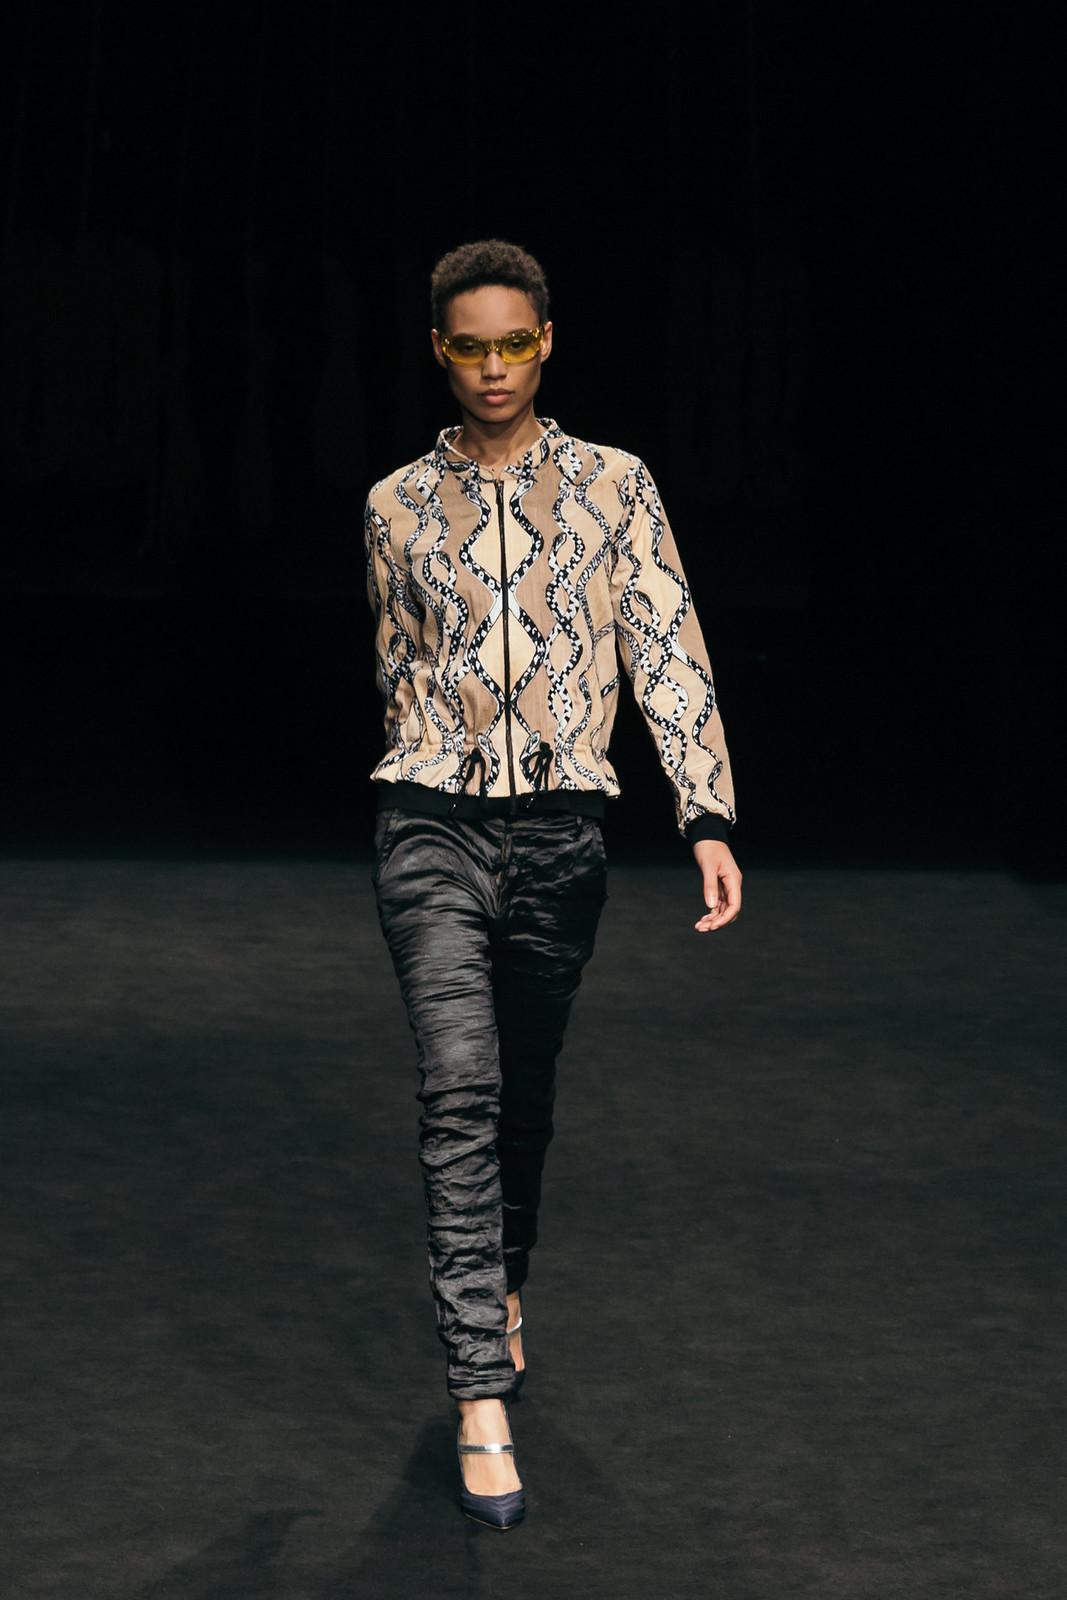 Jessie Chanes - Seams for a desire - 080 Bacelona Fashion #080bcnfasion -18